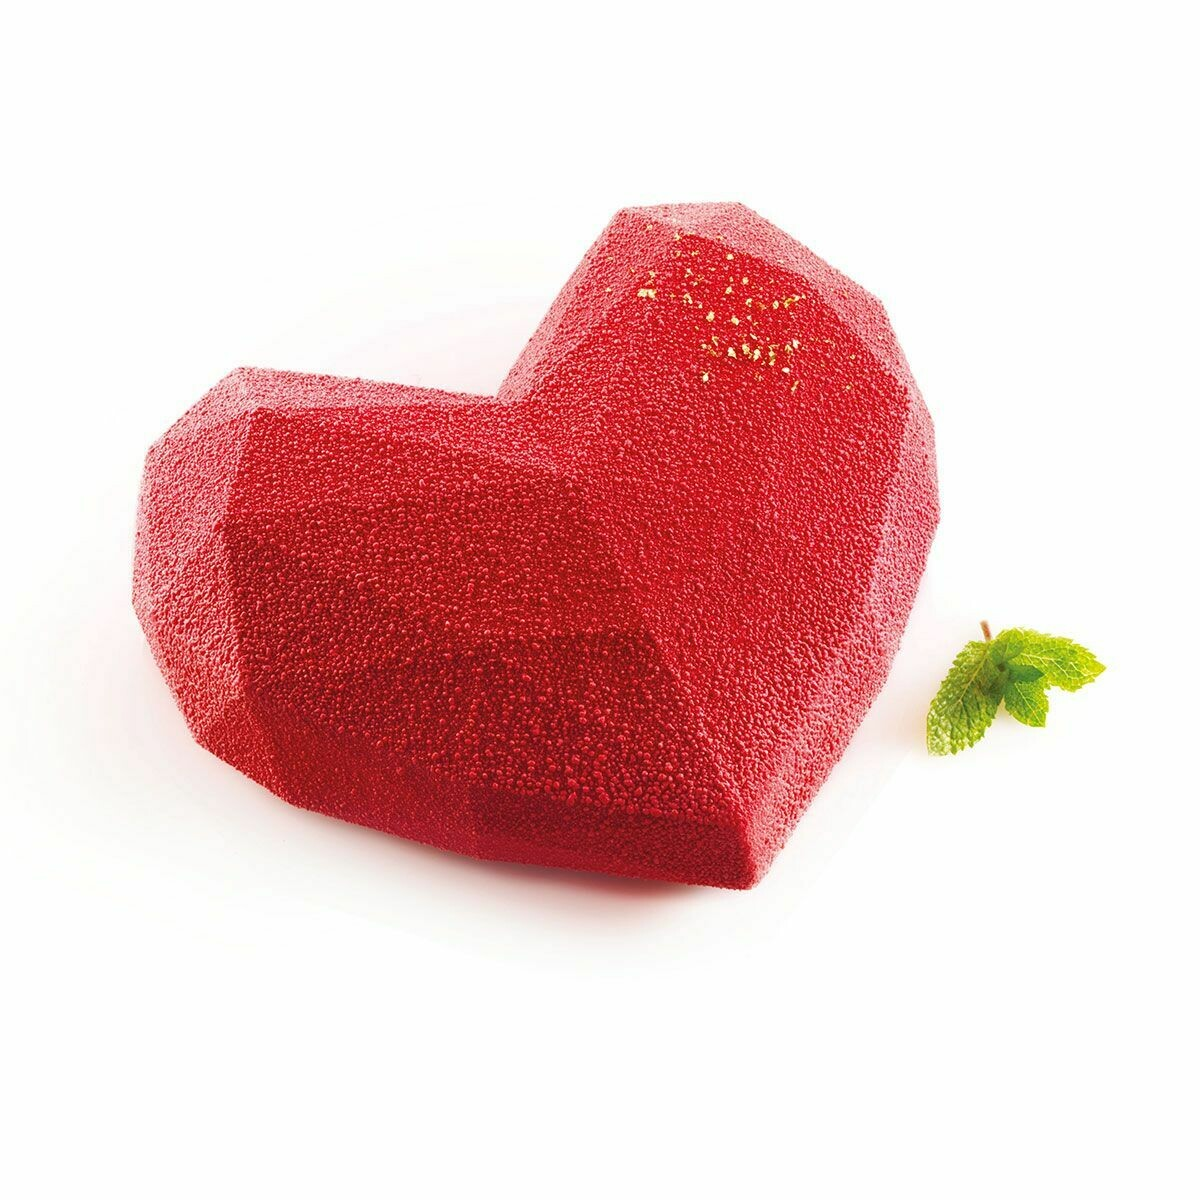 Silikomart Mould Amorini Origami Geometric LARGE Heart - Καλούπι Σιλικόνης για Μεγάλη Γεωμετρική Καρδιά Οριγκάμι